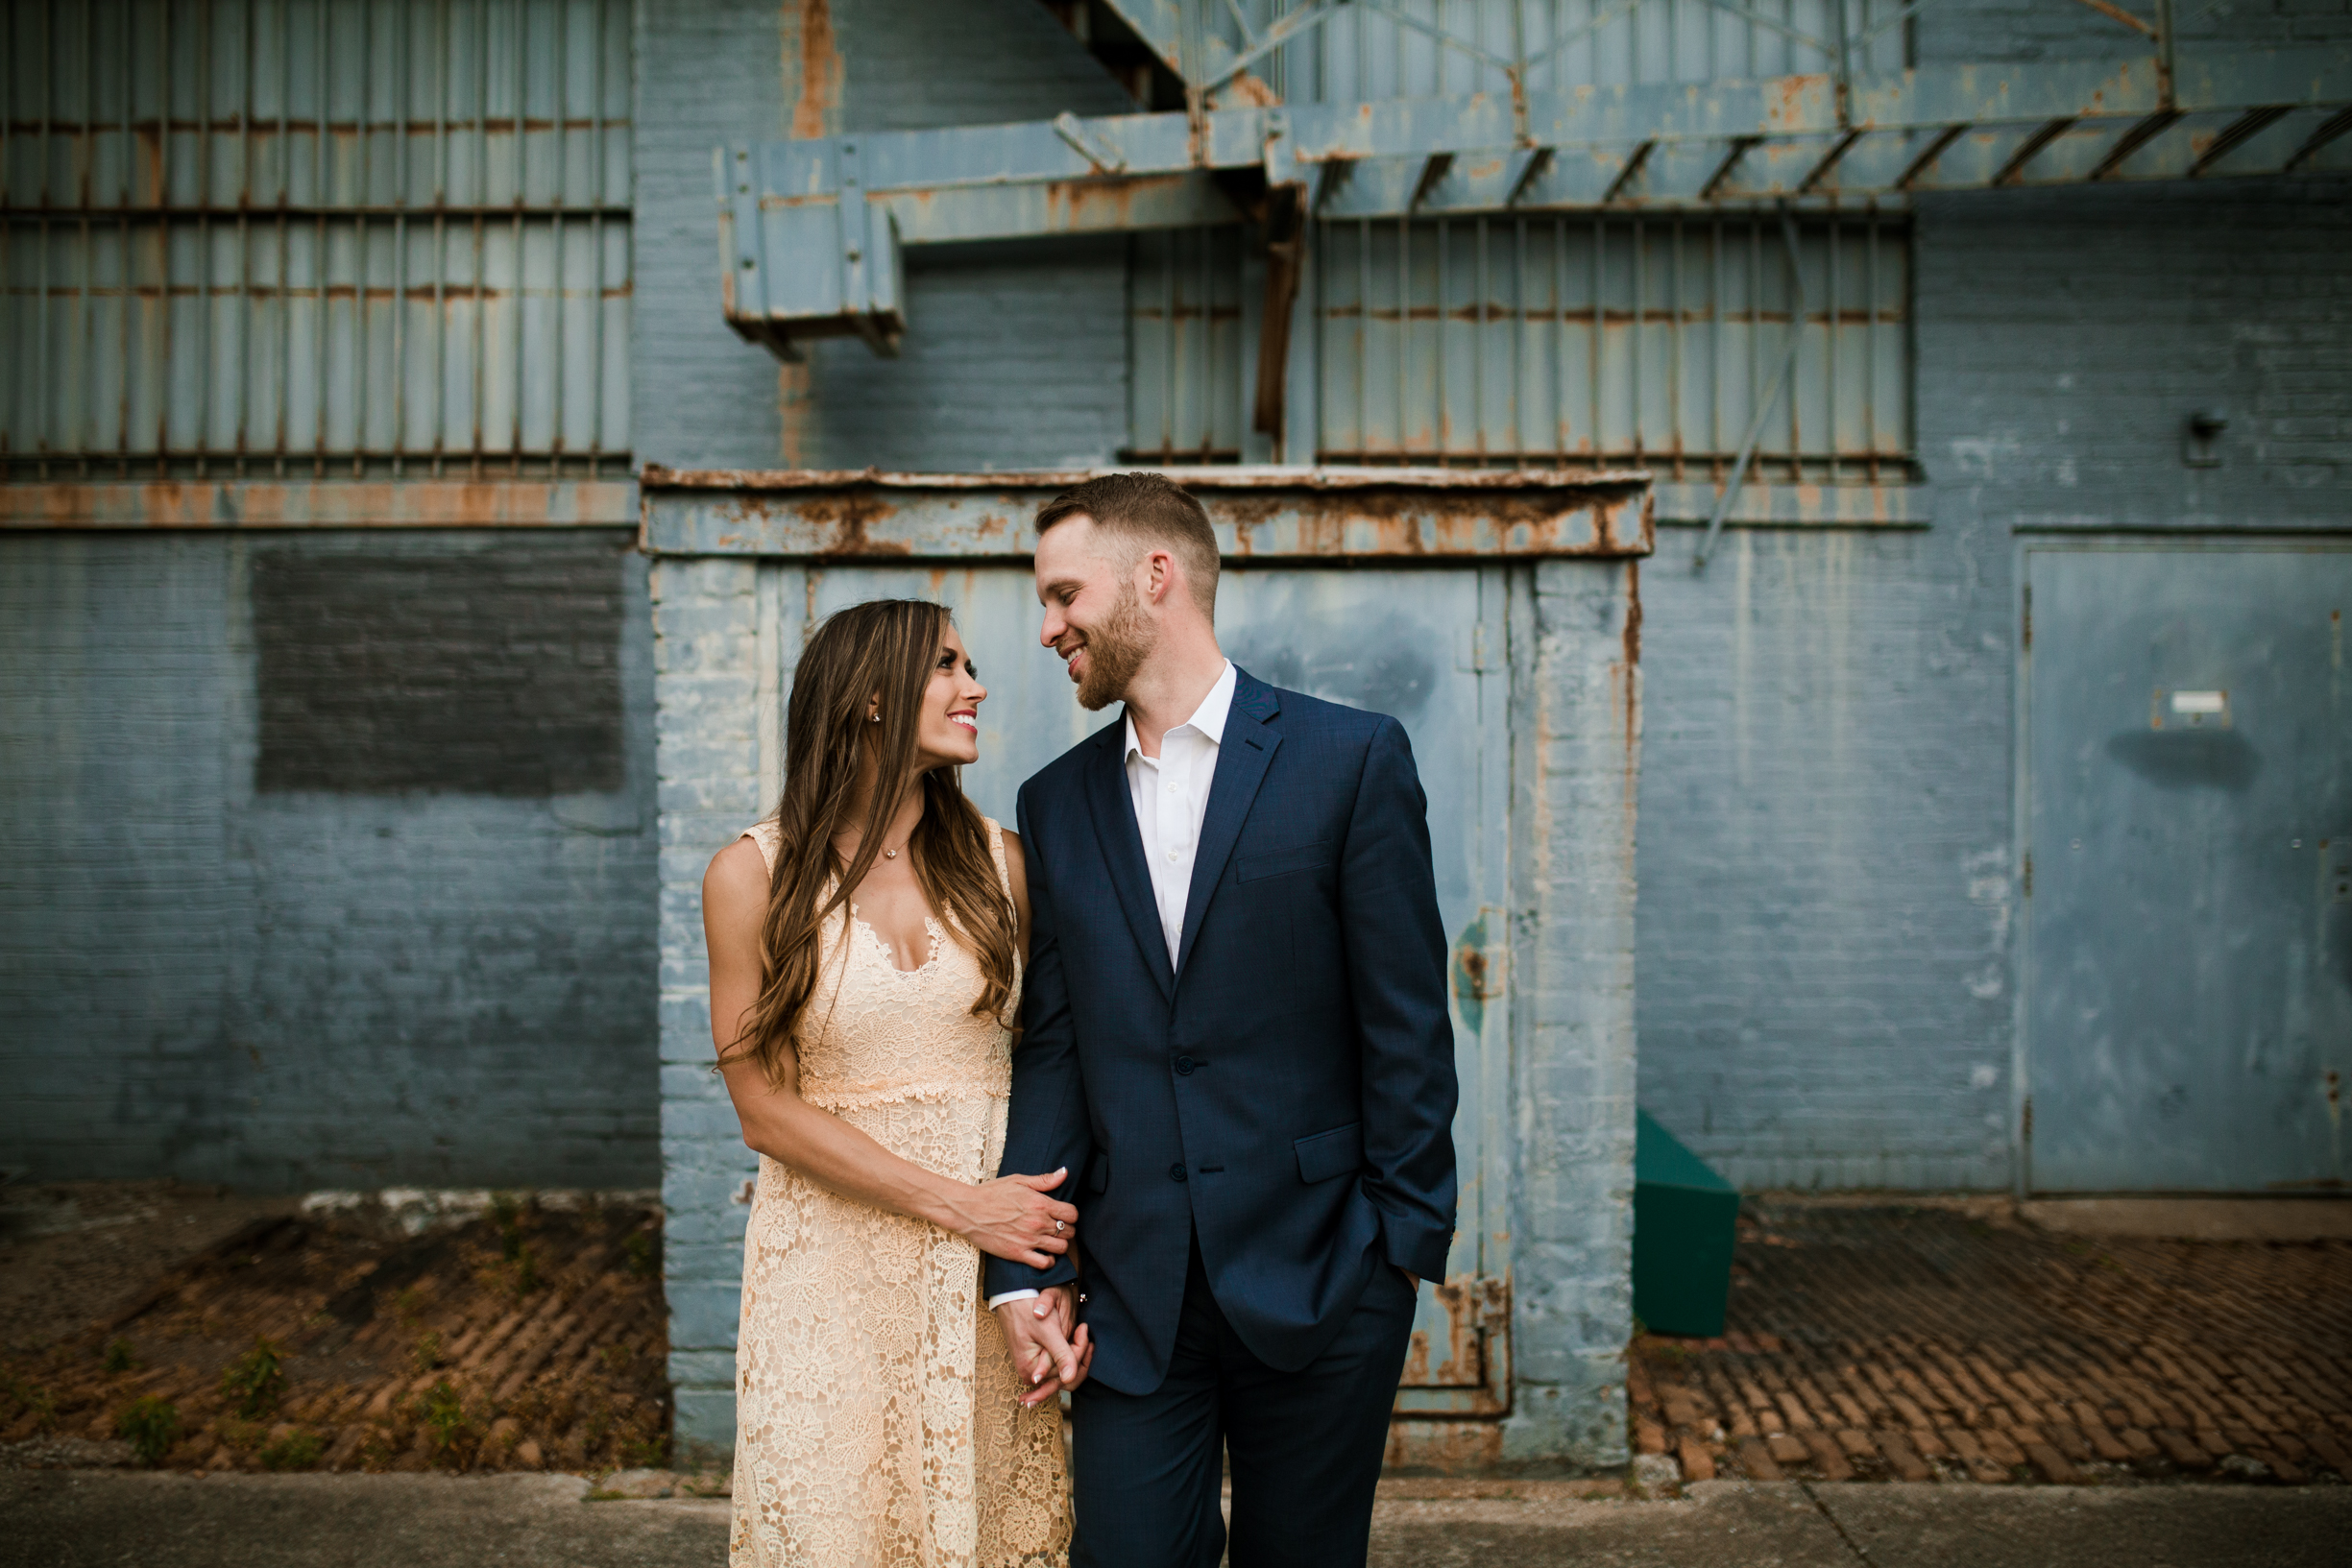 Victoria & Chad Engagement 2018 Crystal Ludwick Photo Louisville Kentucky Wedding Photographer WEBSITE (10 of 48).jpg